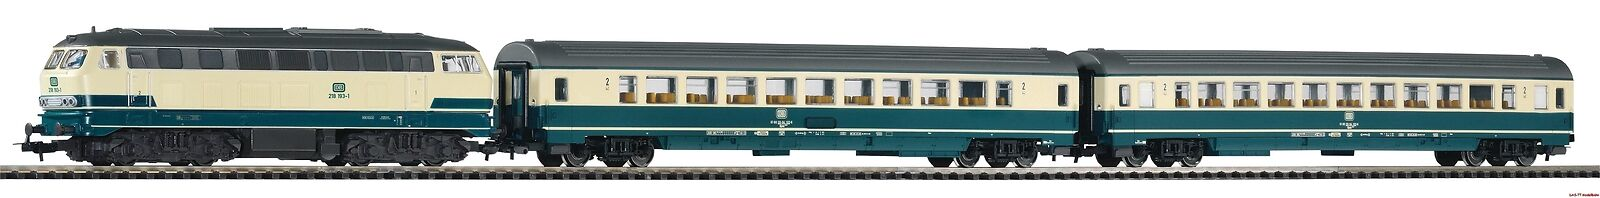 H0 Smkonstkontrollera ljus Set Personenzug BR185 Wagen DB Ep.IV Piko 59007 Neu